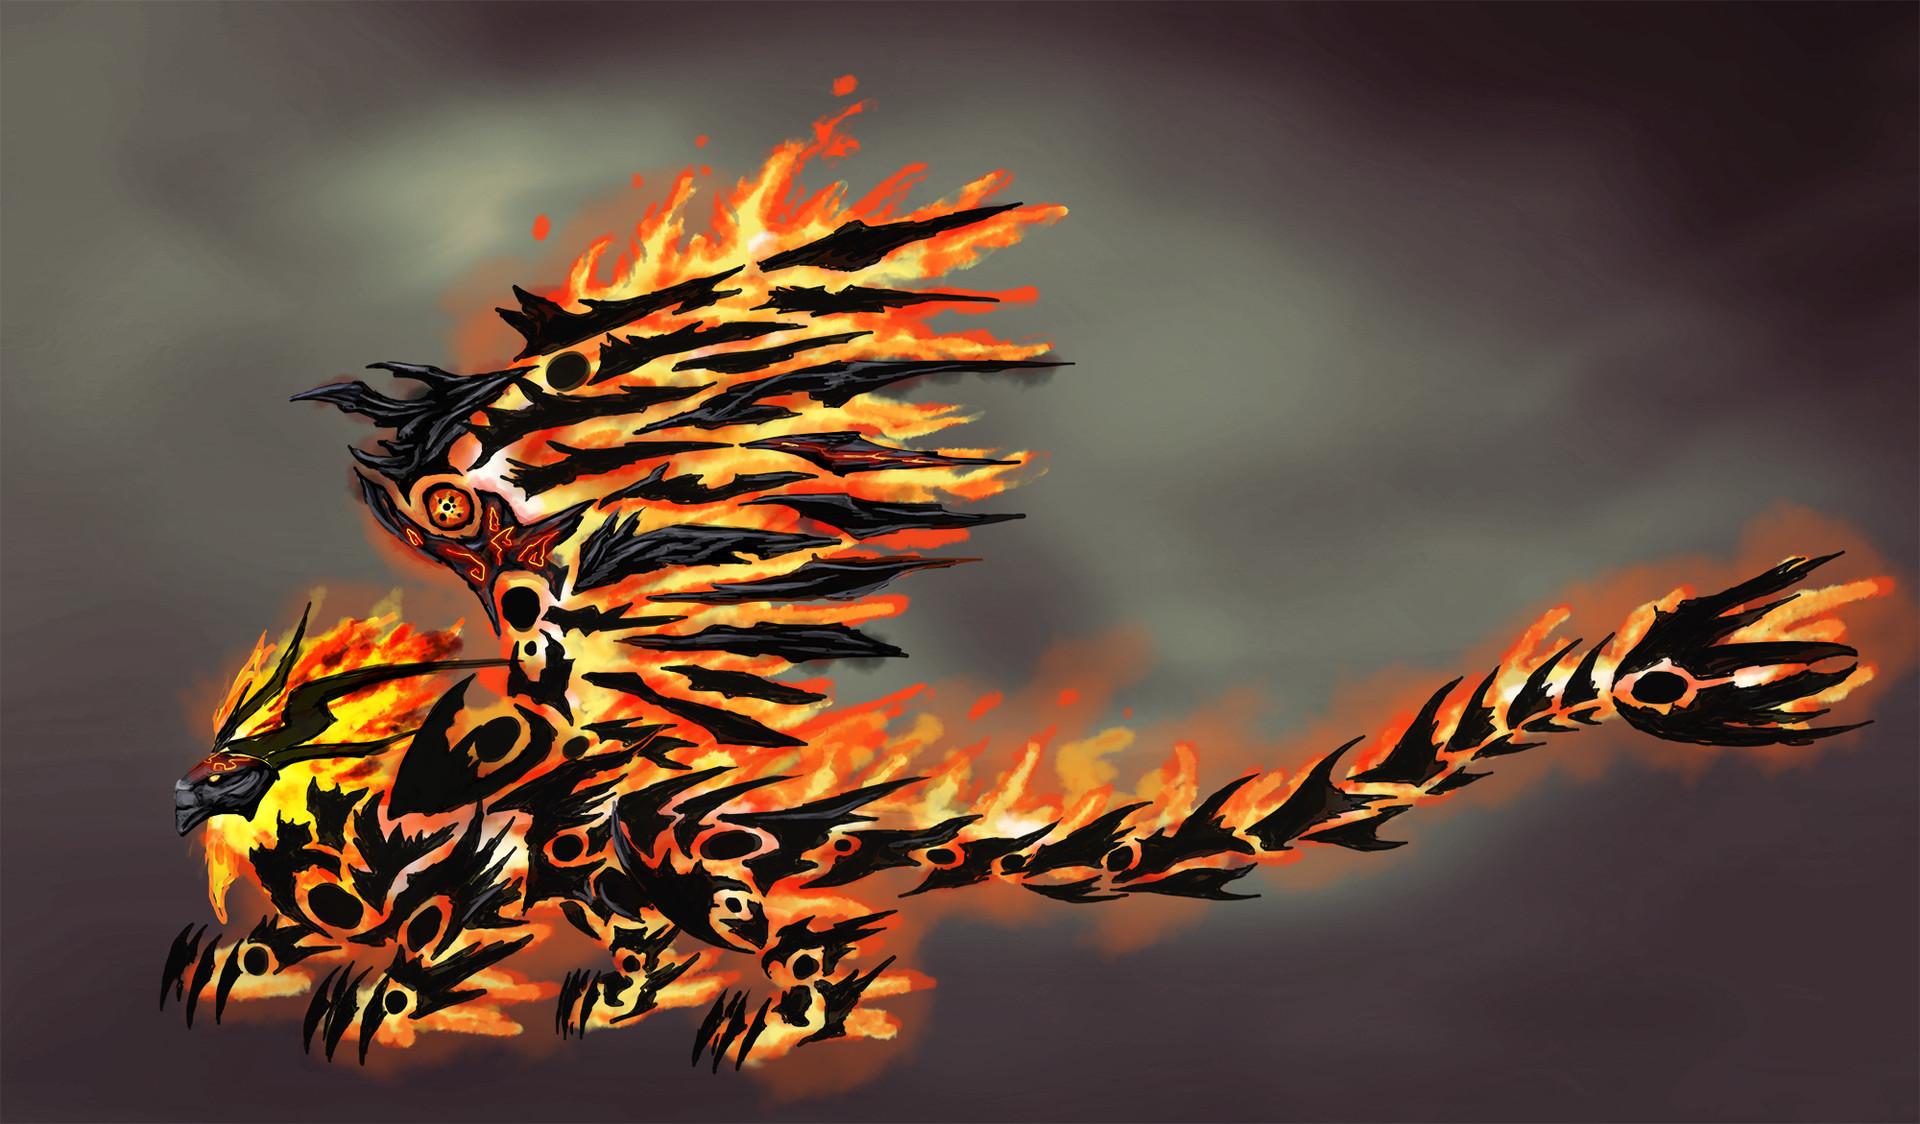 Orm irian firelion11